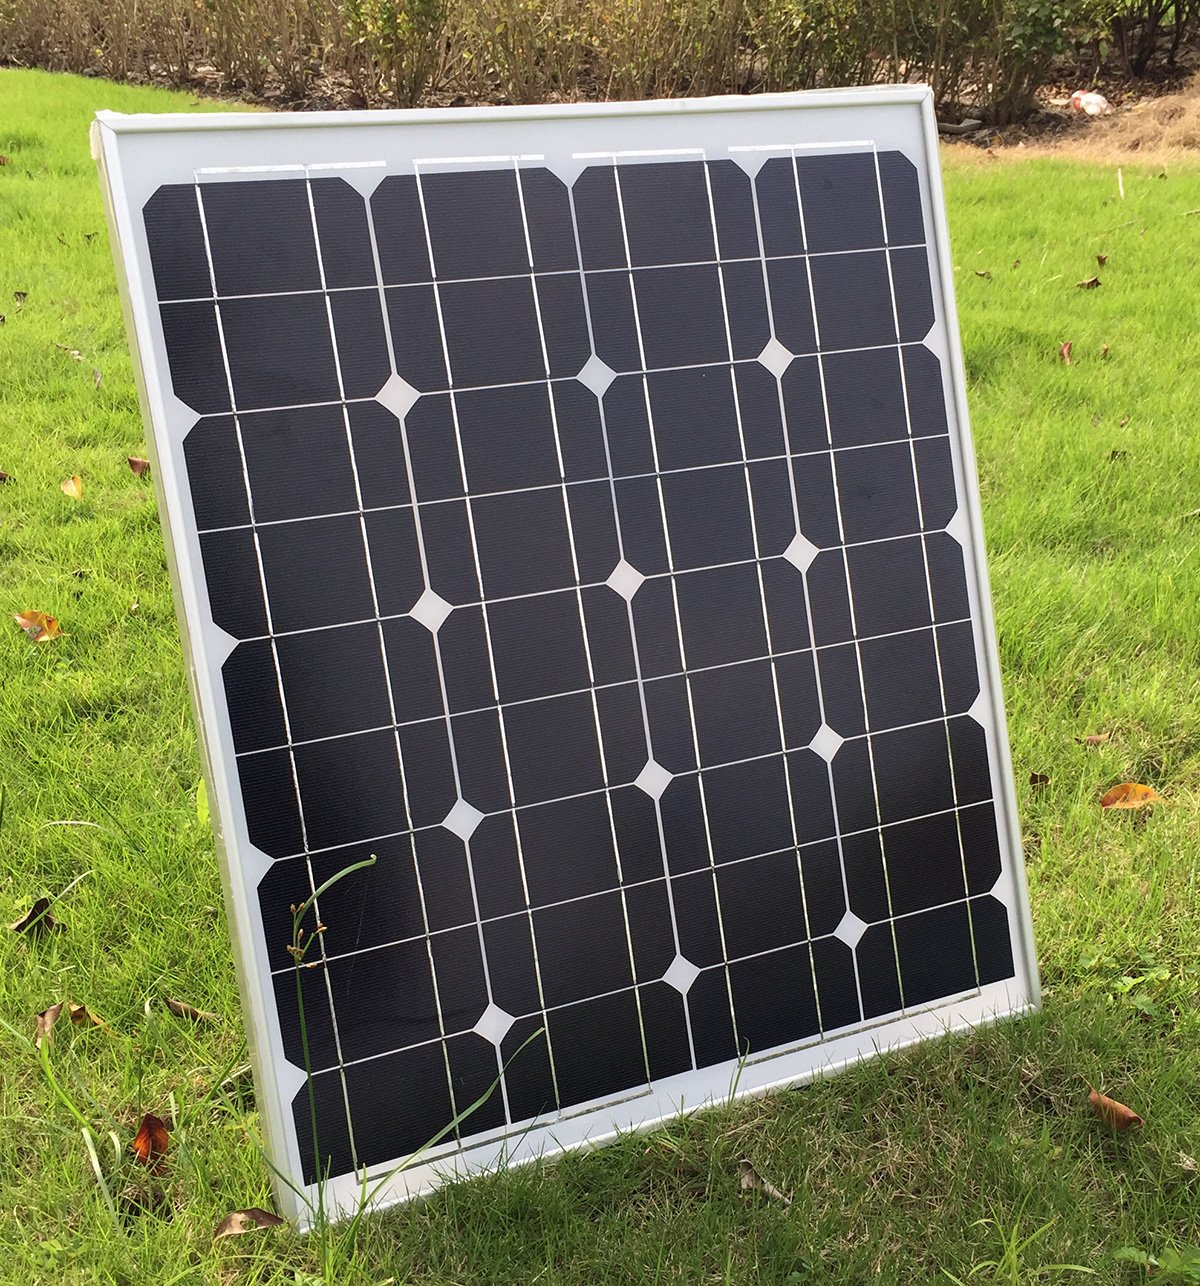 SUNDELY® 50W 12V Monocrystalline Solar Panel Kit for Camping Boating Motorhome Caravan + 3 Meter Cable & MC4 Connectors